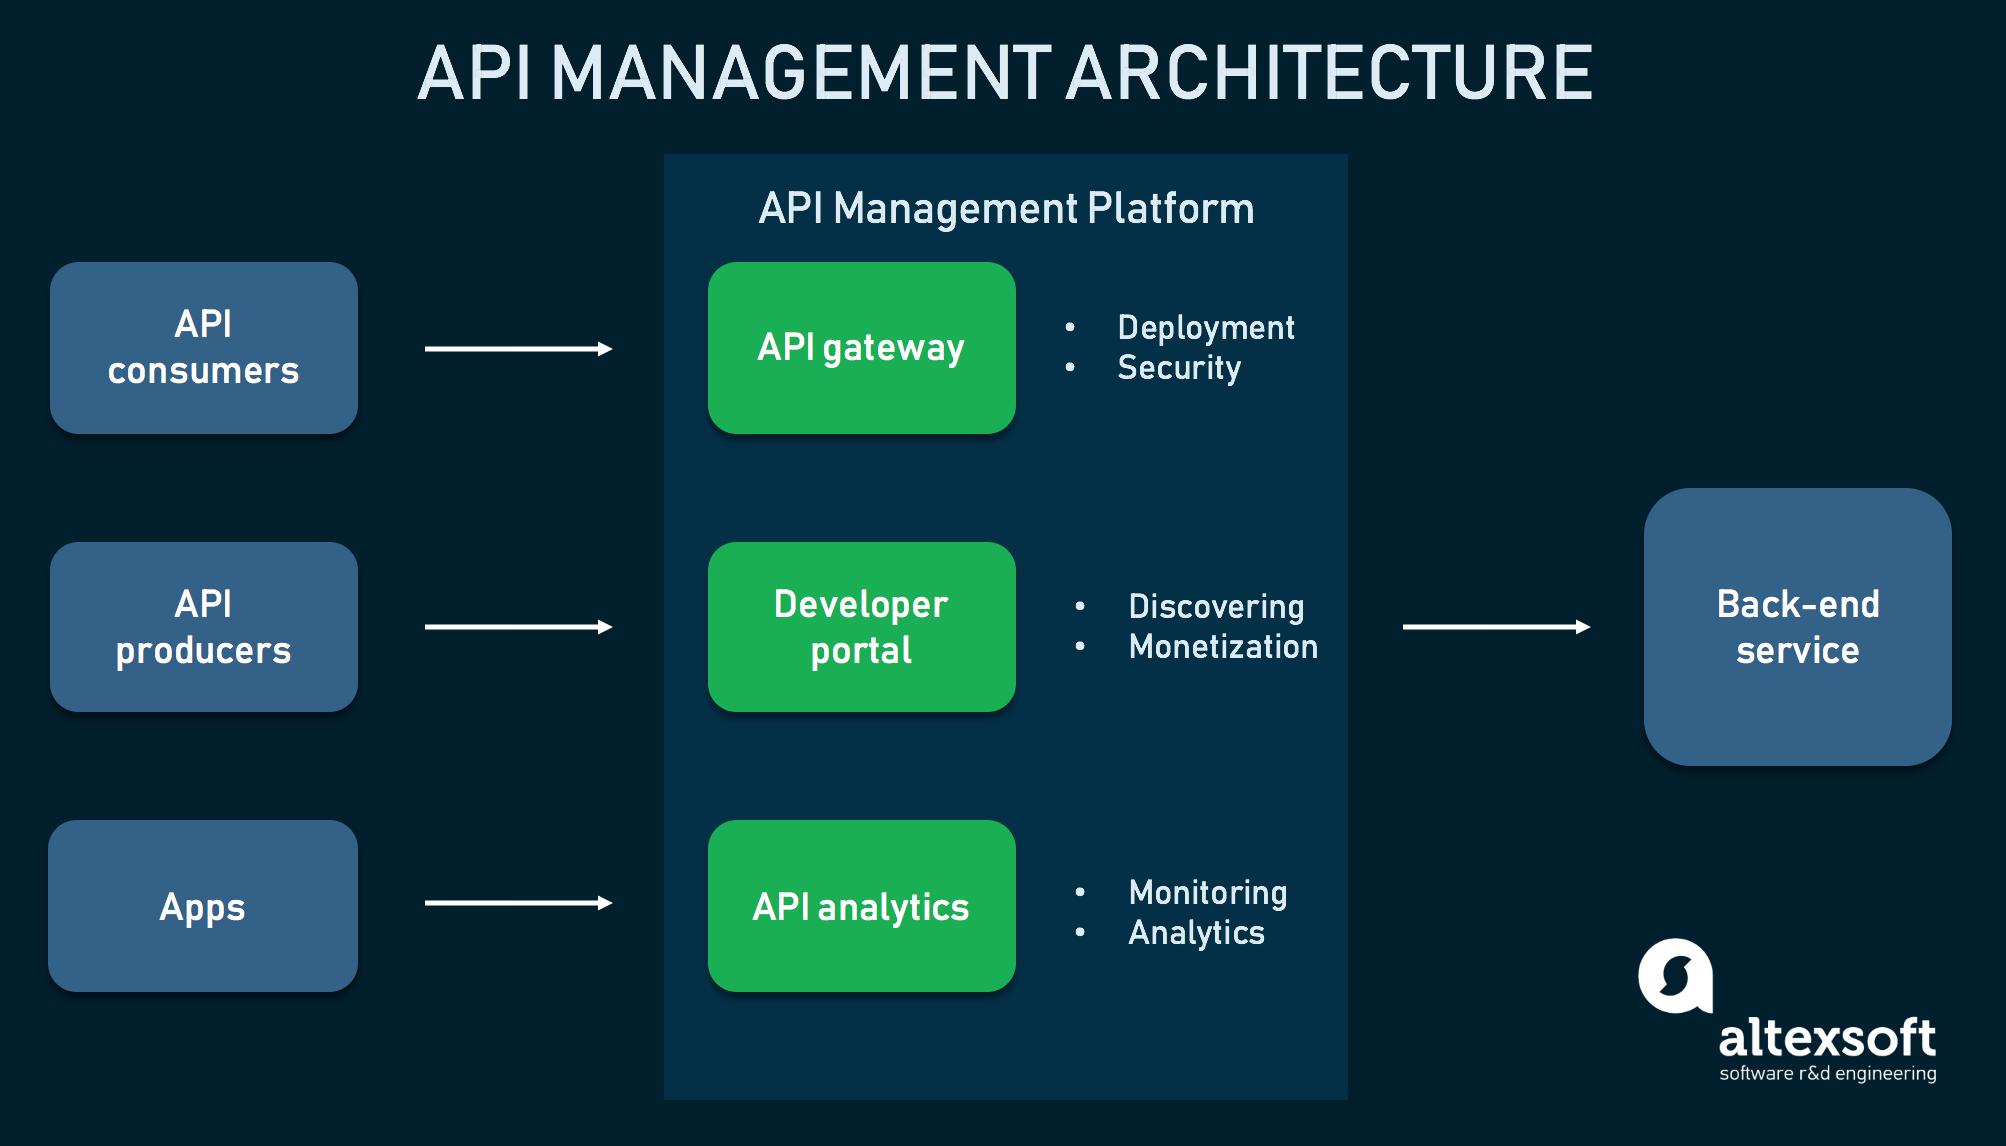 The architecture of an API management platform